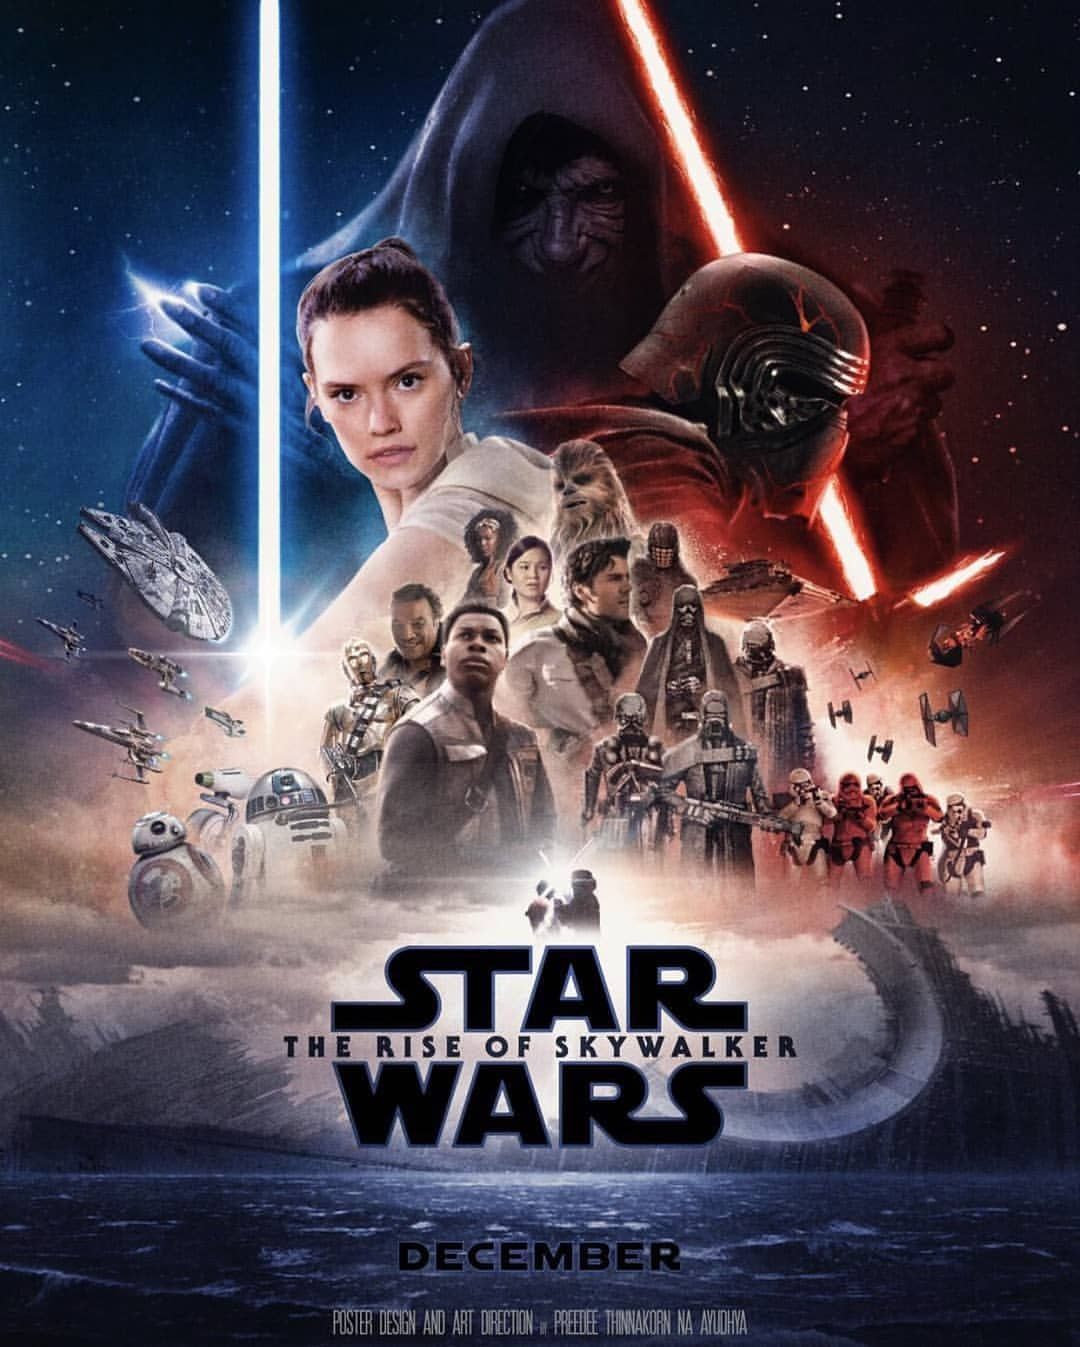 Star Wars Behind the Scenes on Instagram Star Wars Episode IX The Rise of Skywalker poster Art by decvader  Star Wars Episode IX The Rise of Skywalker poster Art b